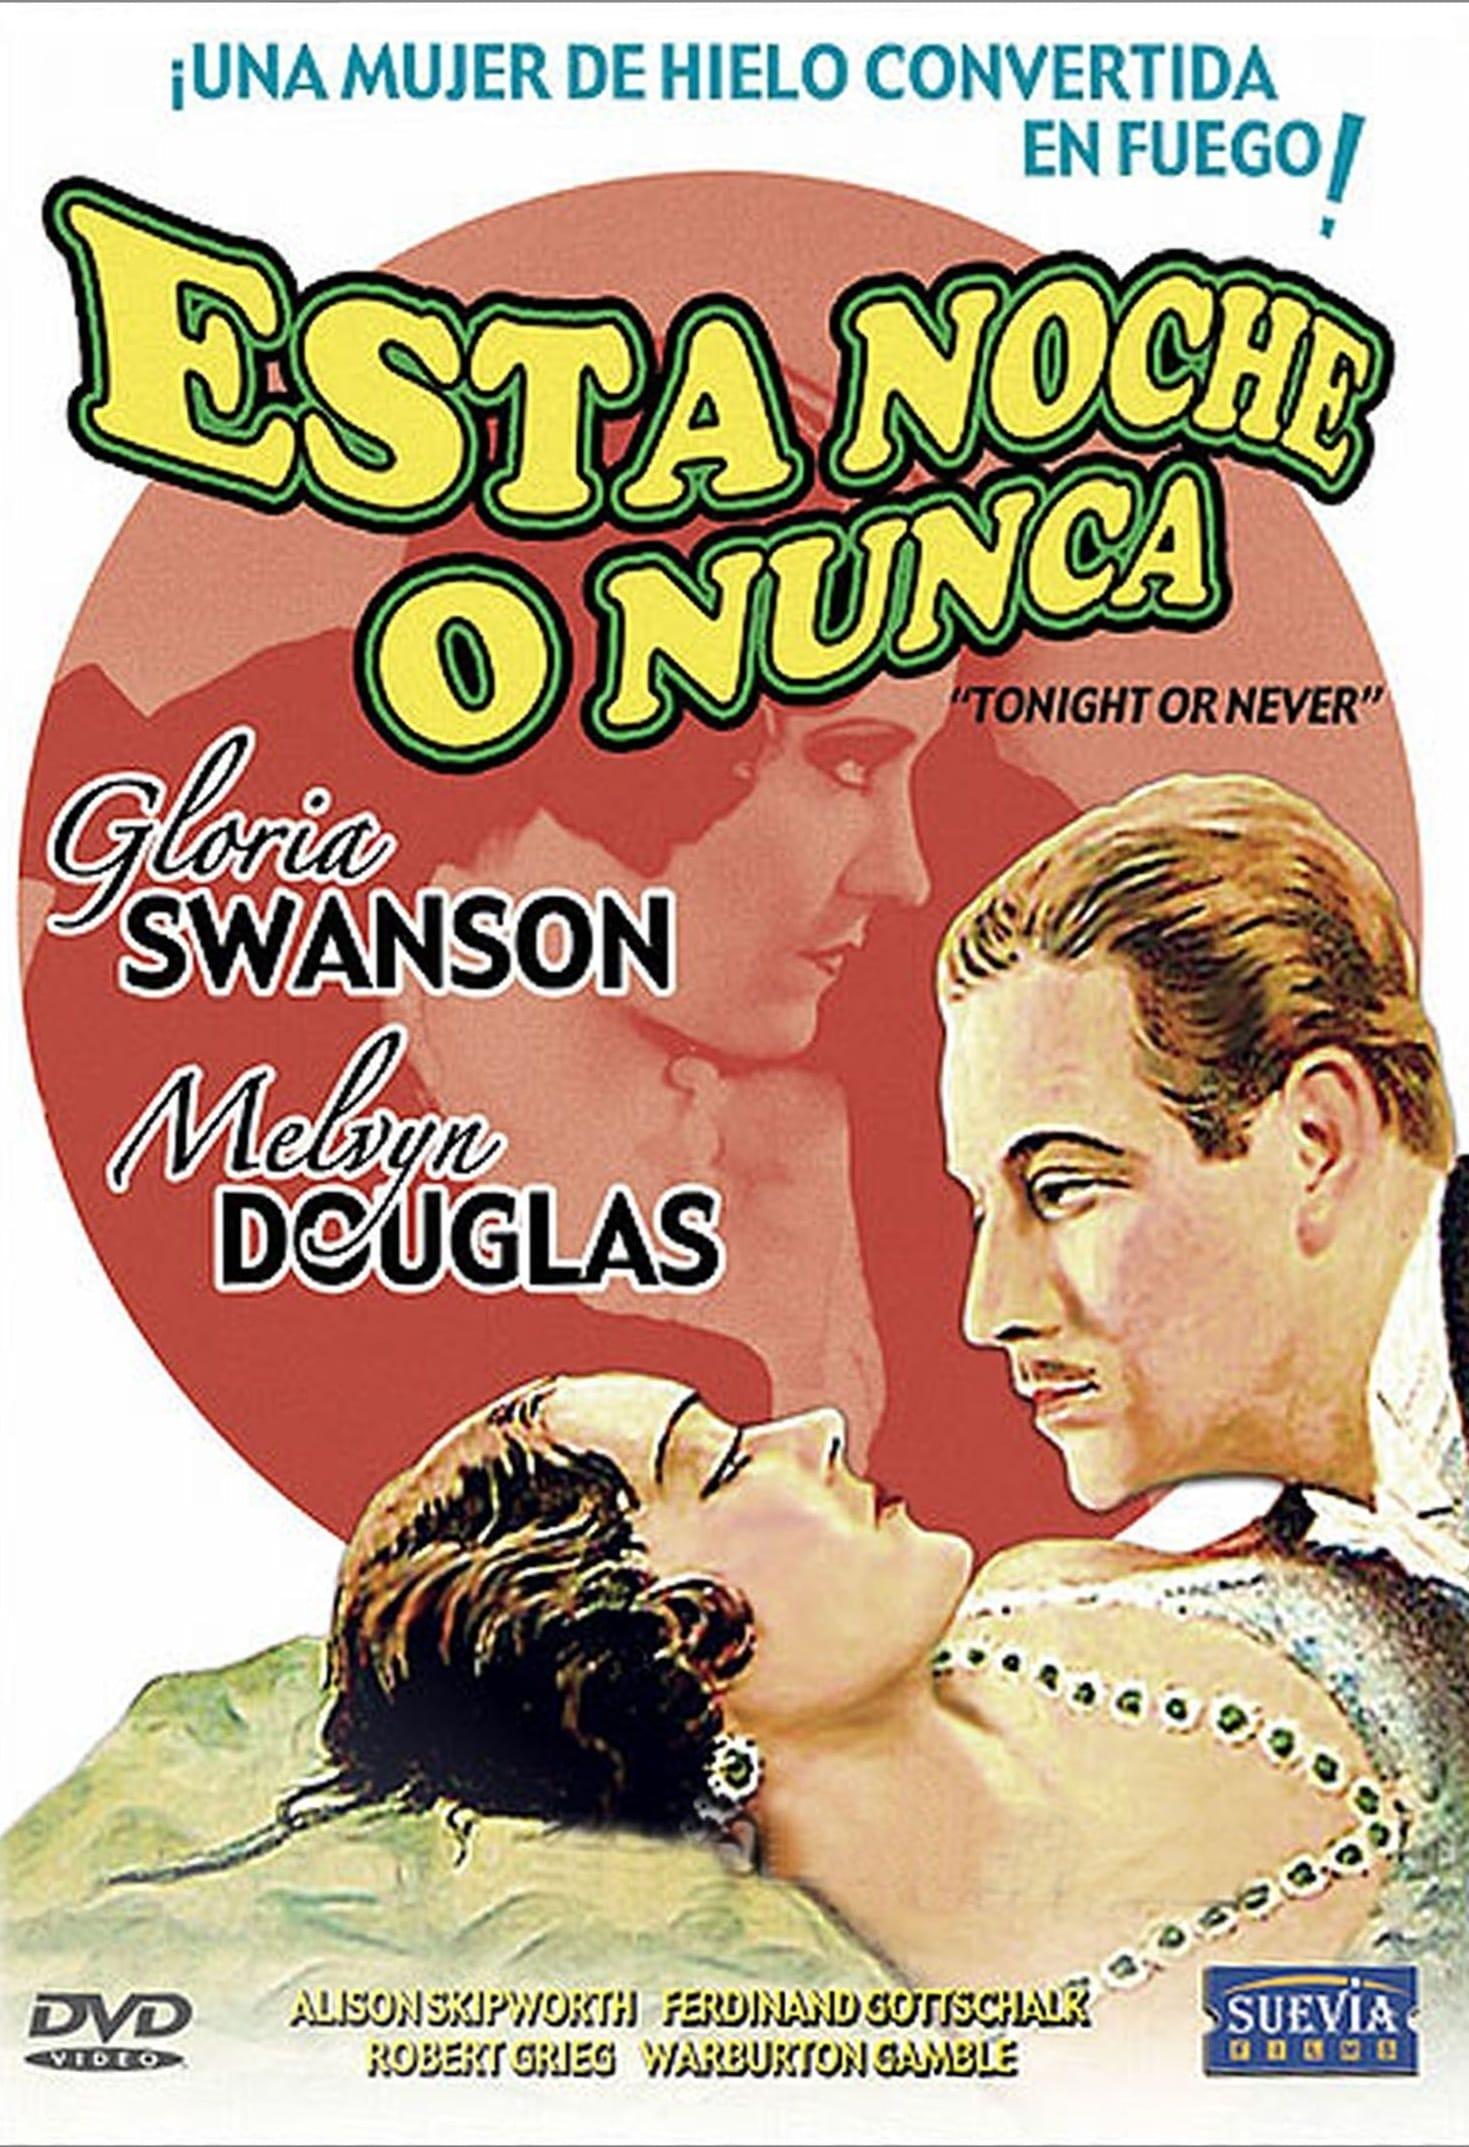 Esta noche o nunca 1931 la pel cula cinef lica - Diva noche reviews ...